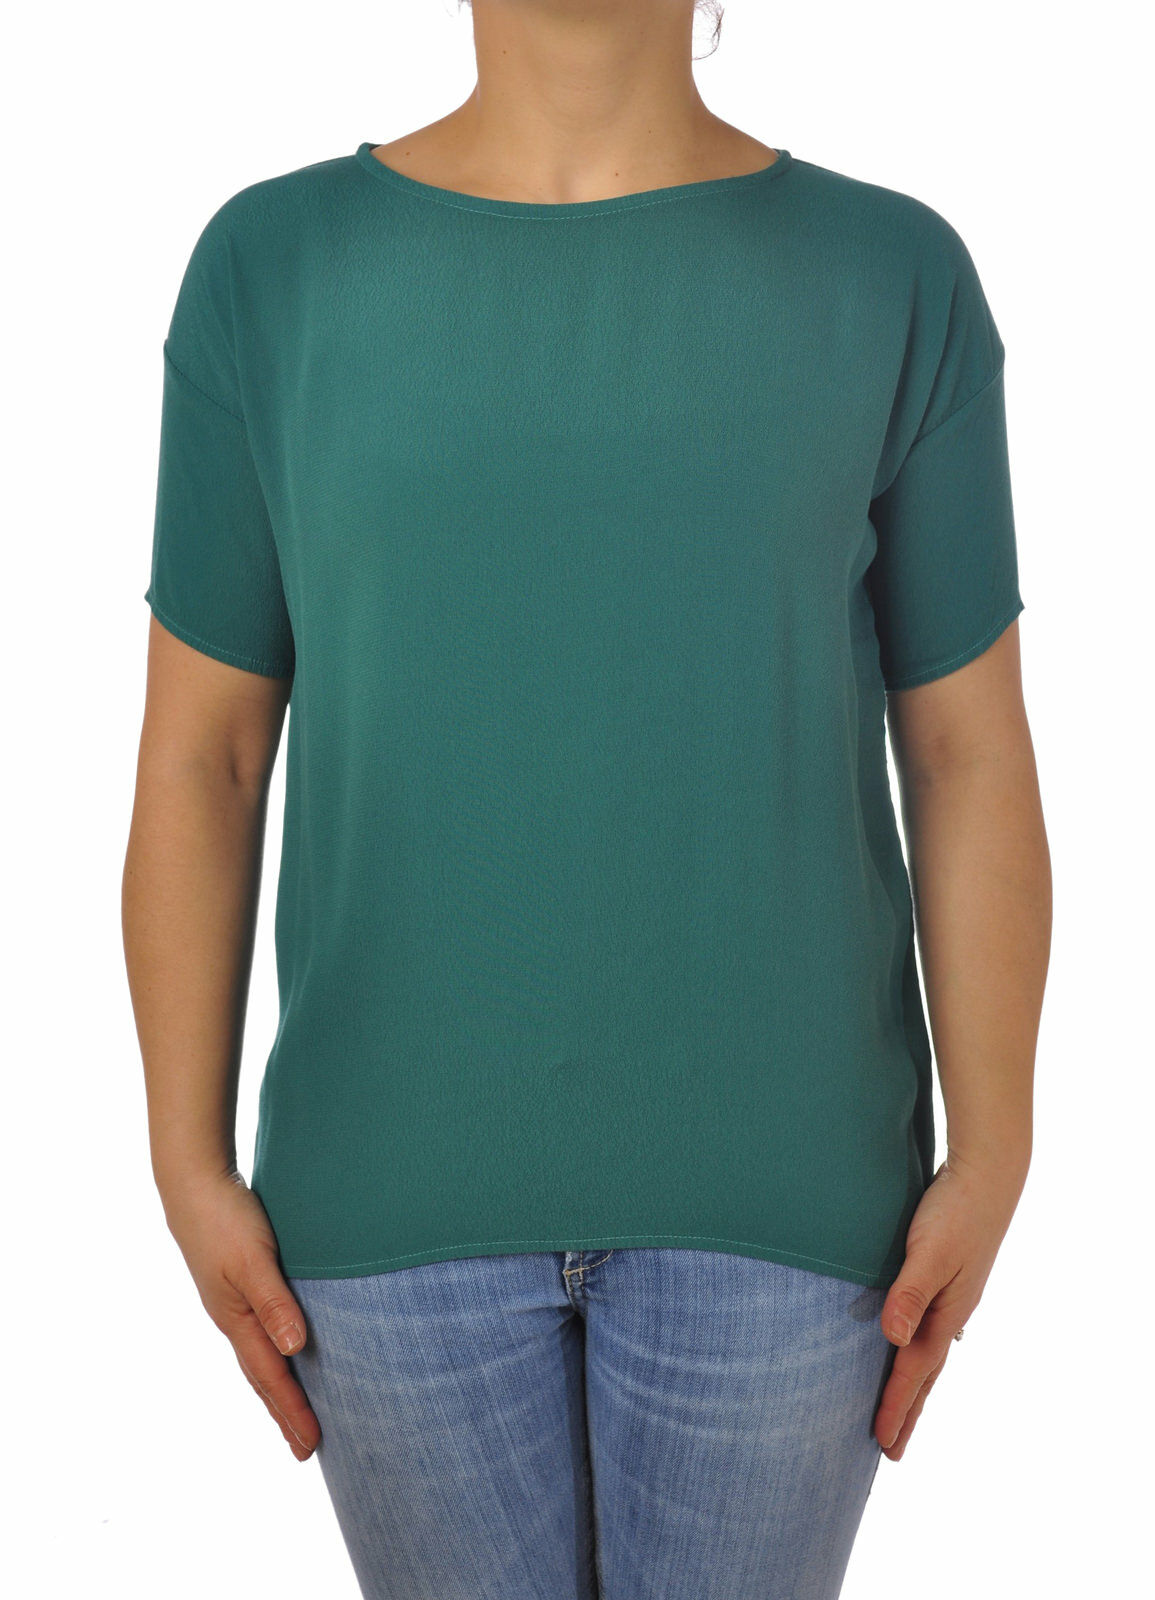 CROSSLEY - Camicie-Bluse - Damenschuhe - Verde - 5086324D183703